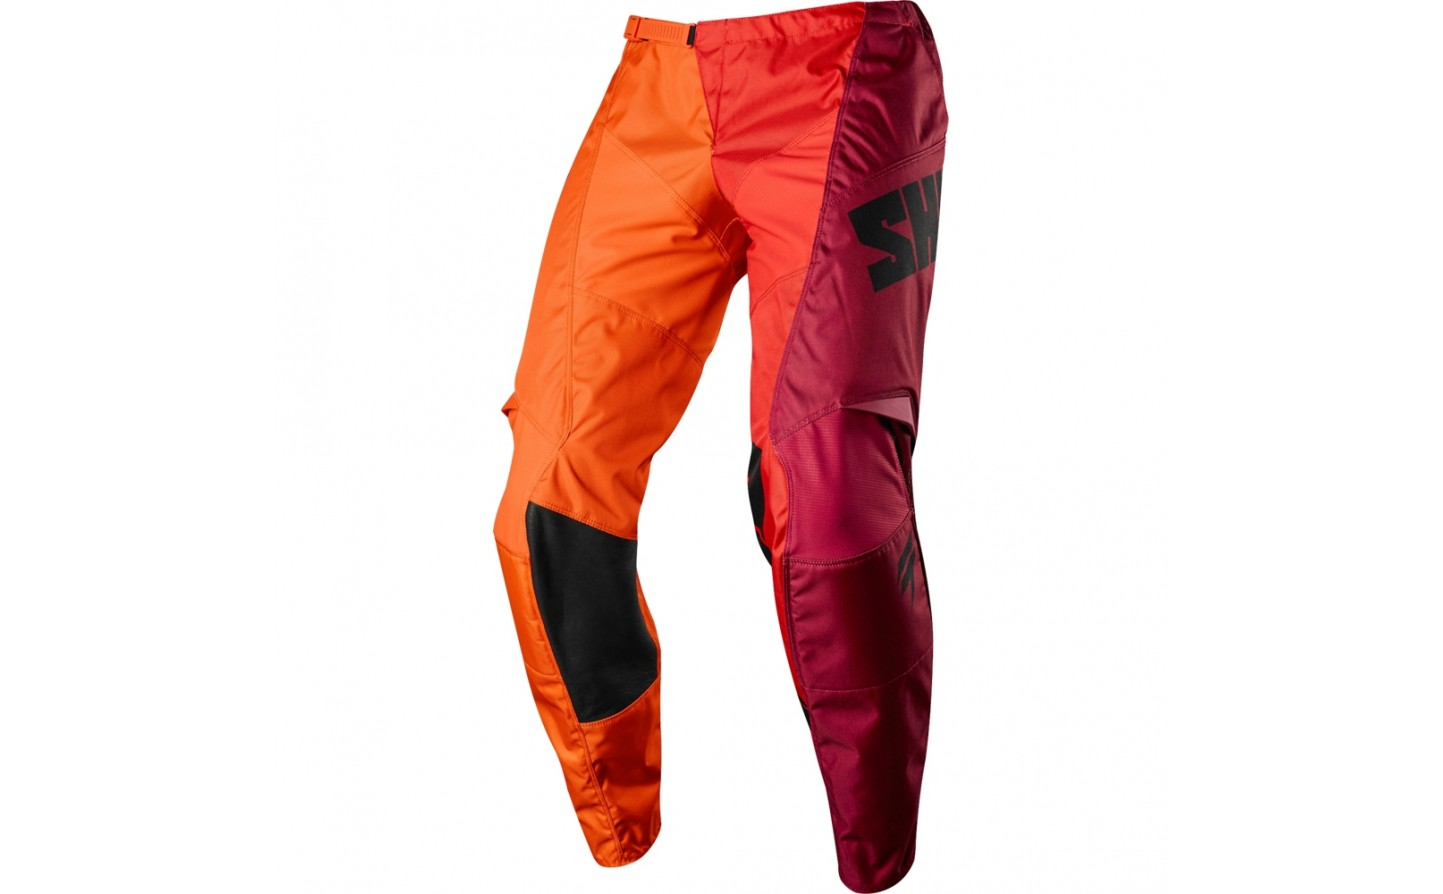 pantalon shift label whit3 tarmac naranja talle 38